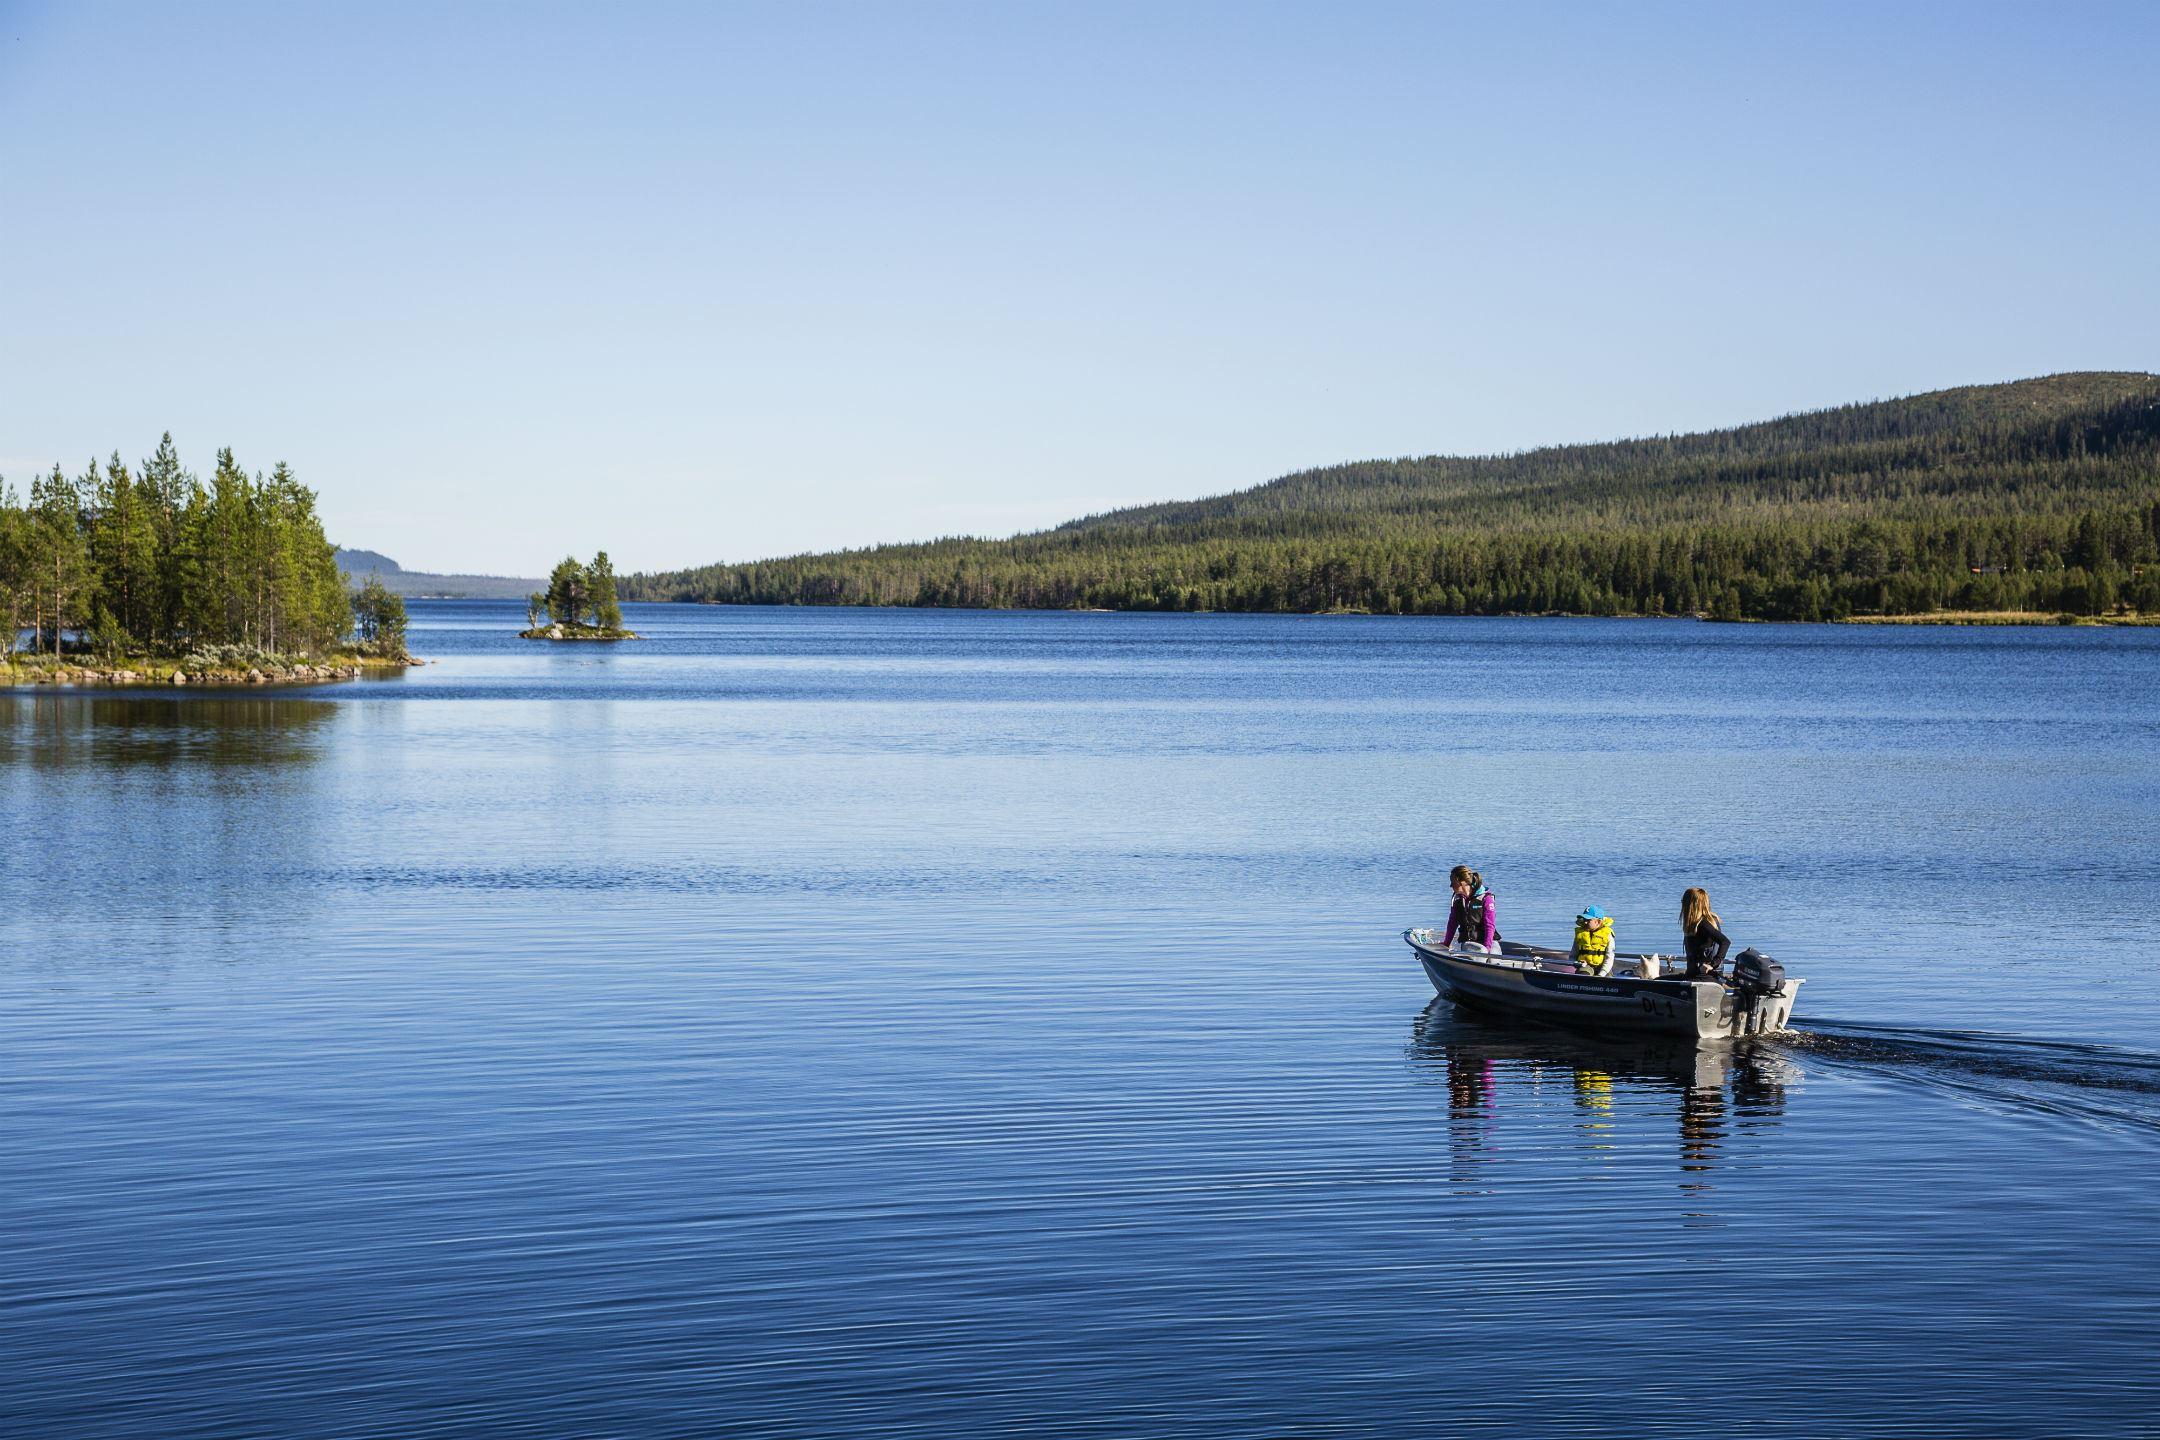 Hyr båt på Destination Lofsdalen